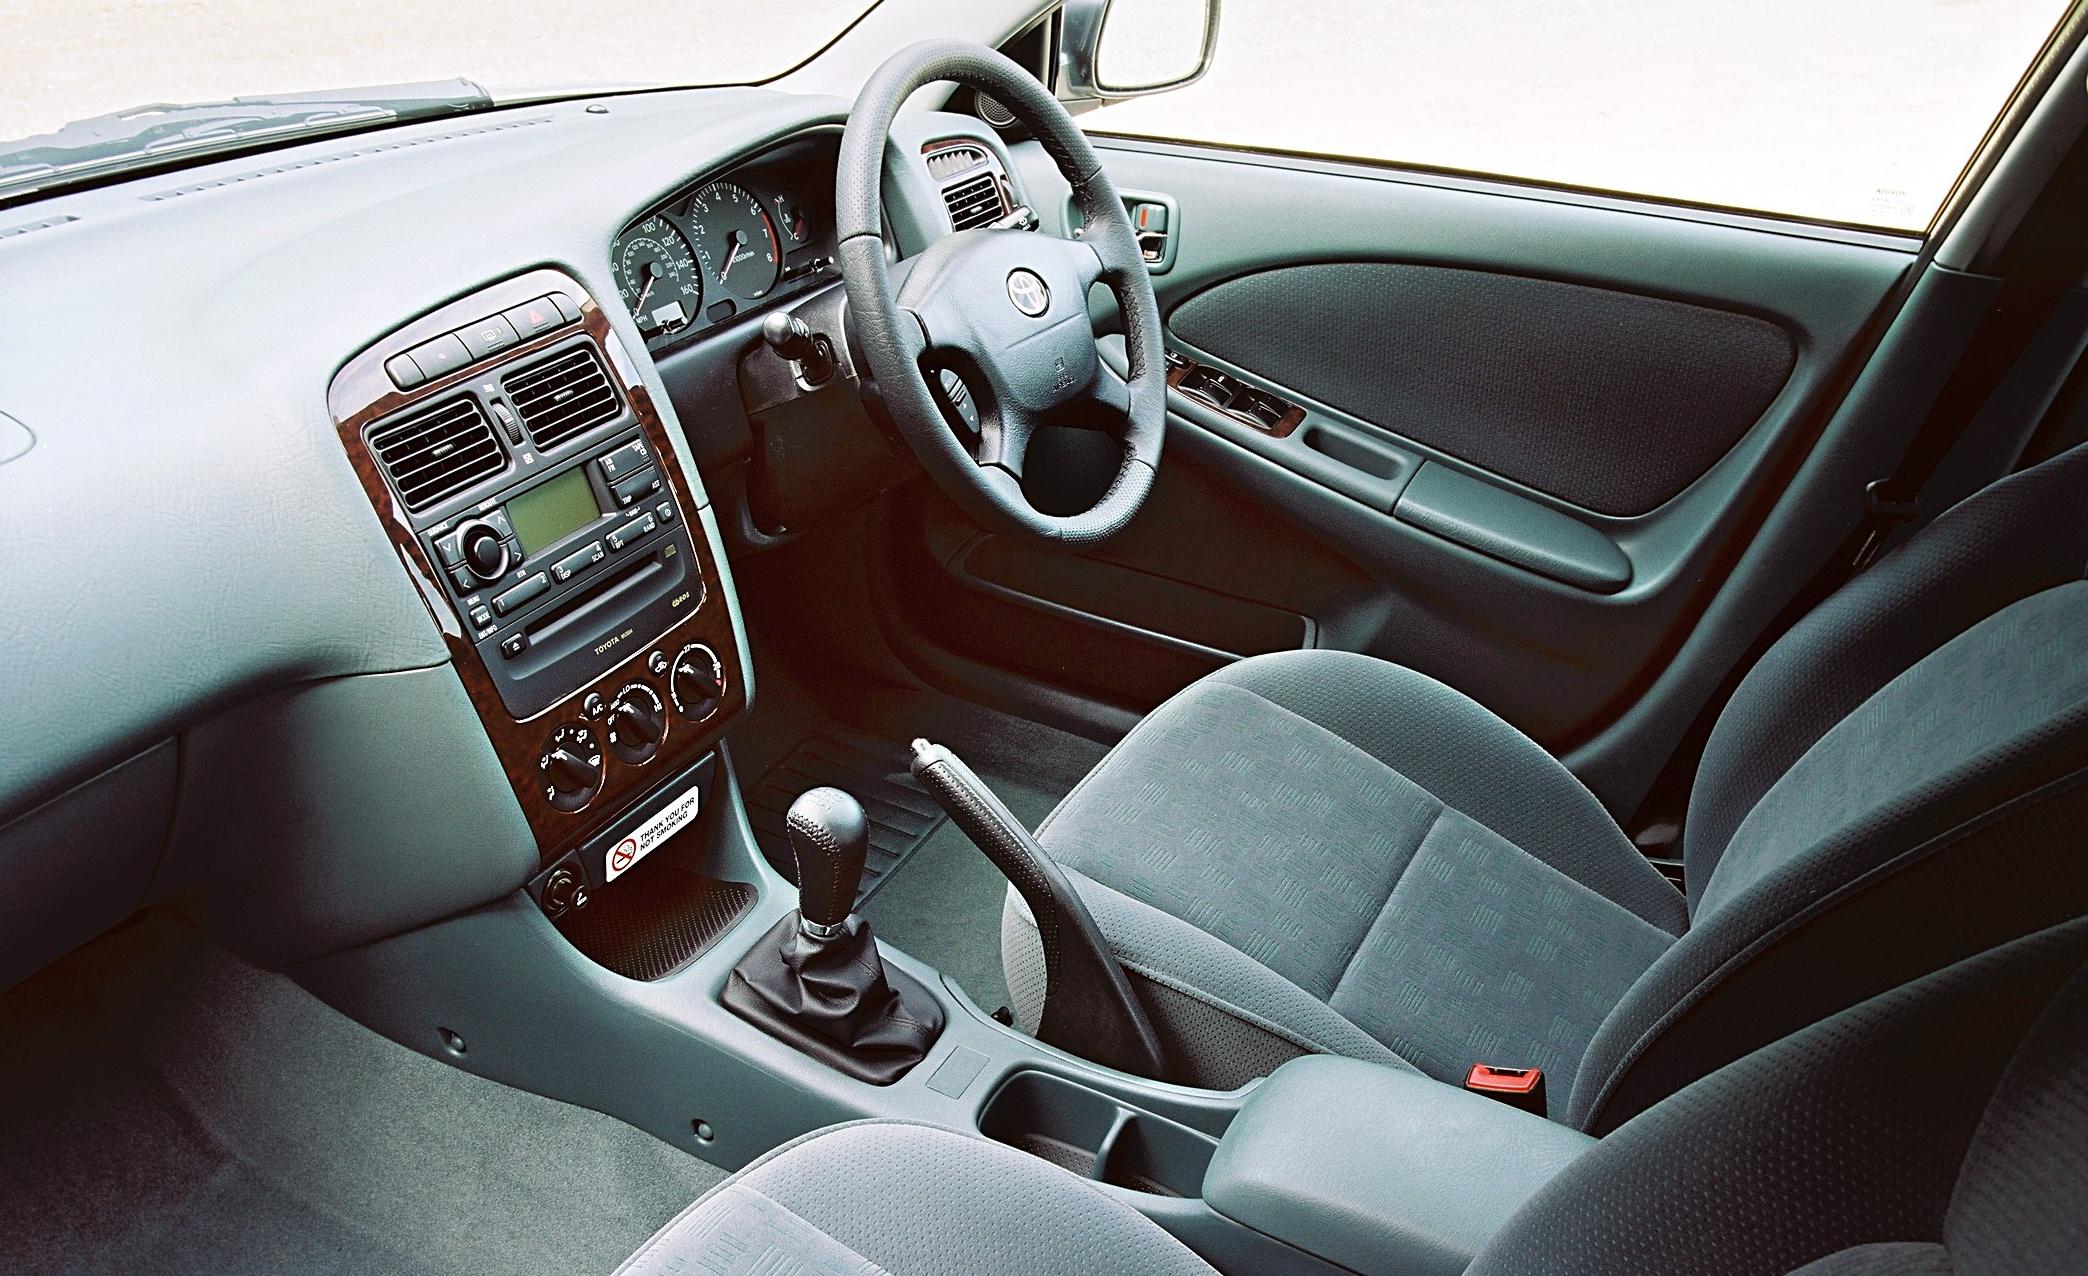 Toyota Avensis I 1997 - 2000 Hatchback 5 door #2